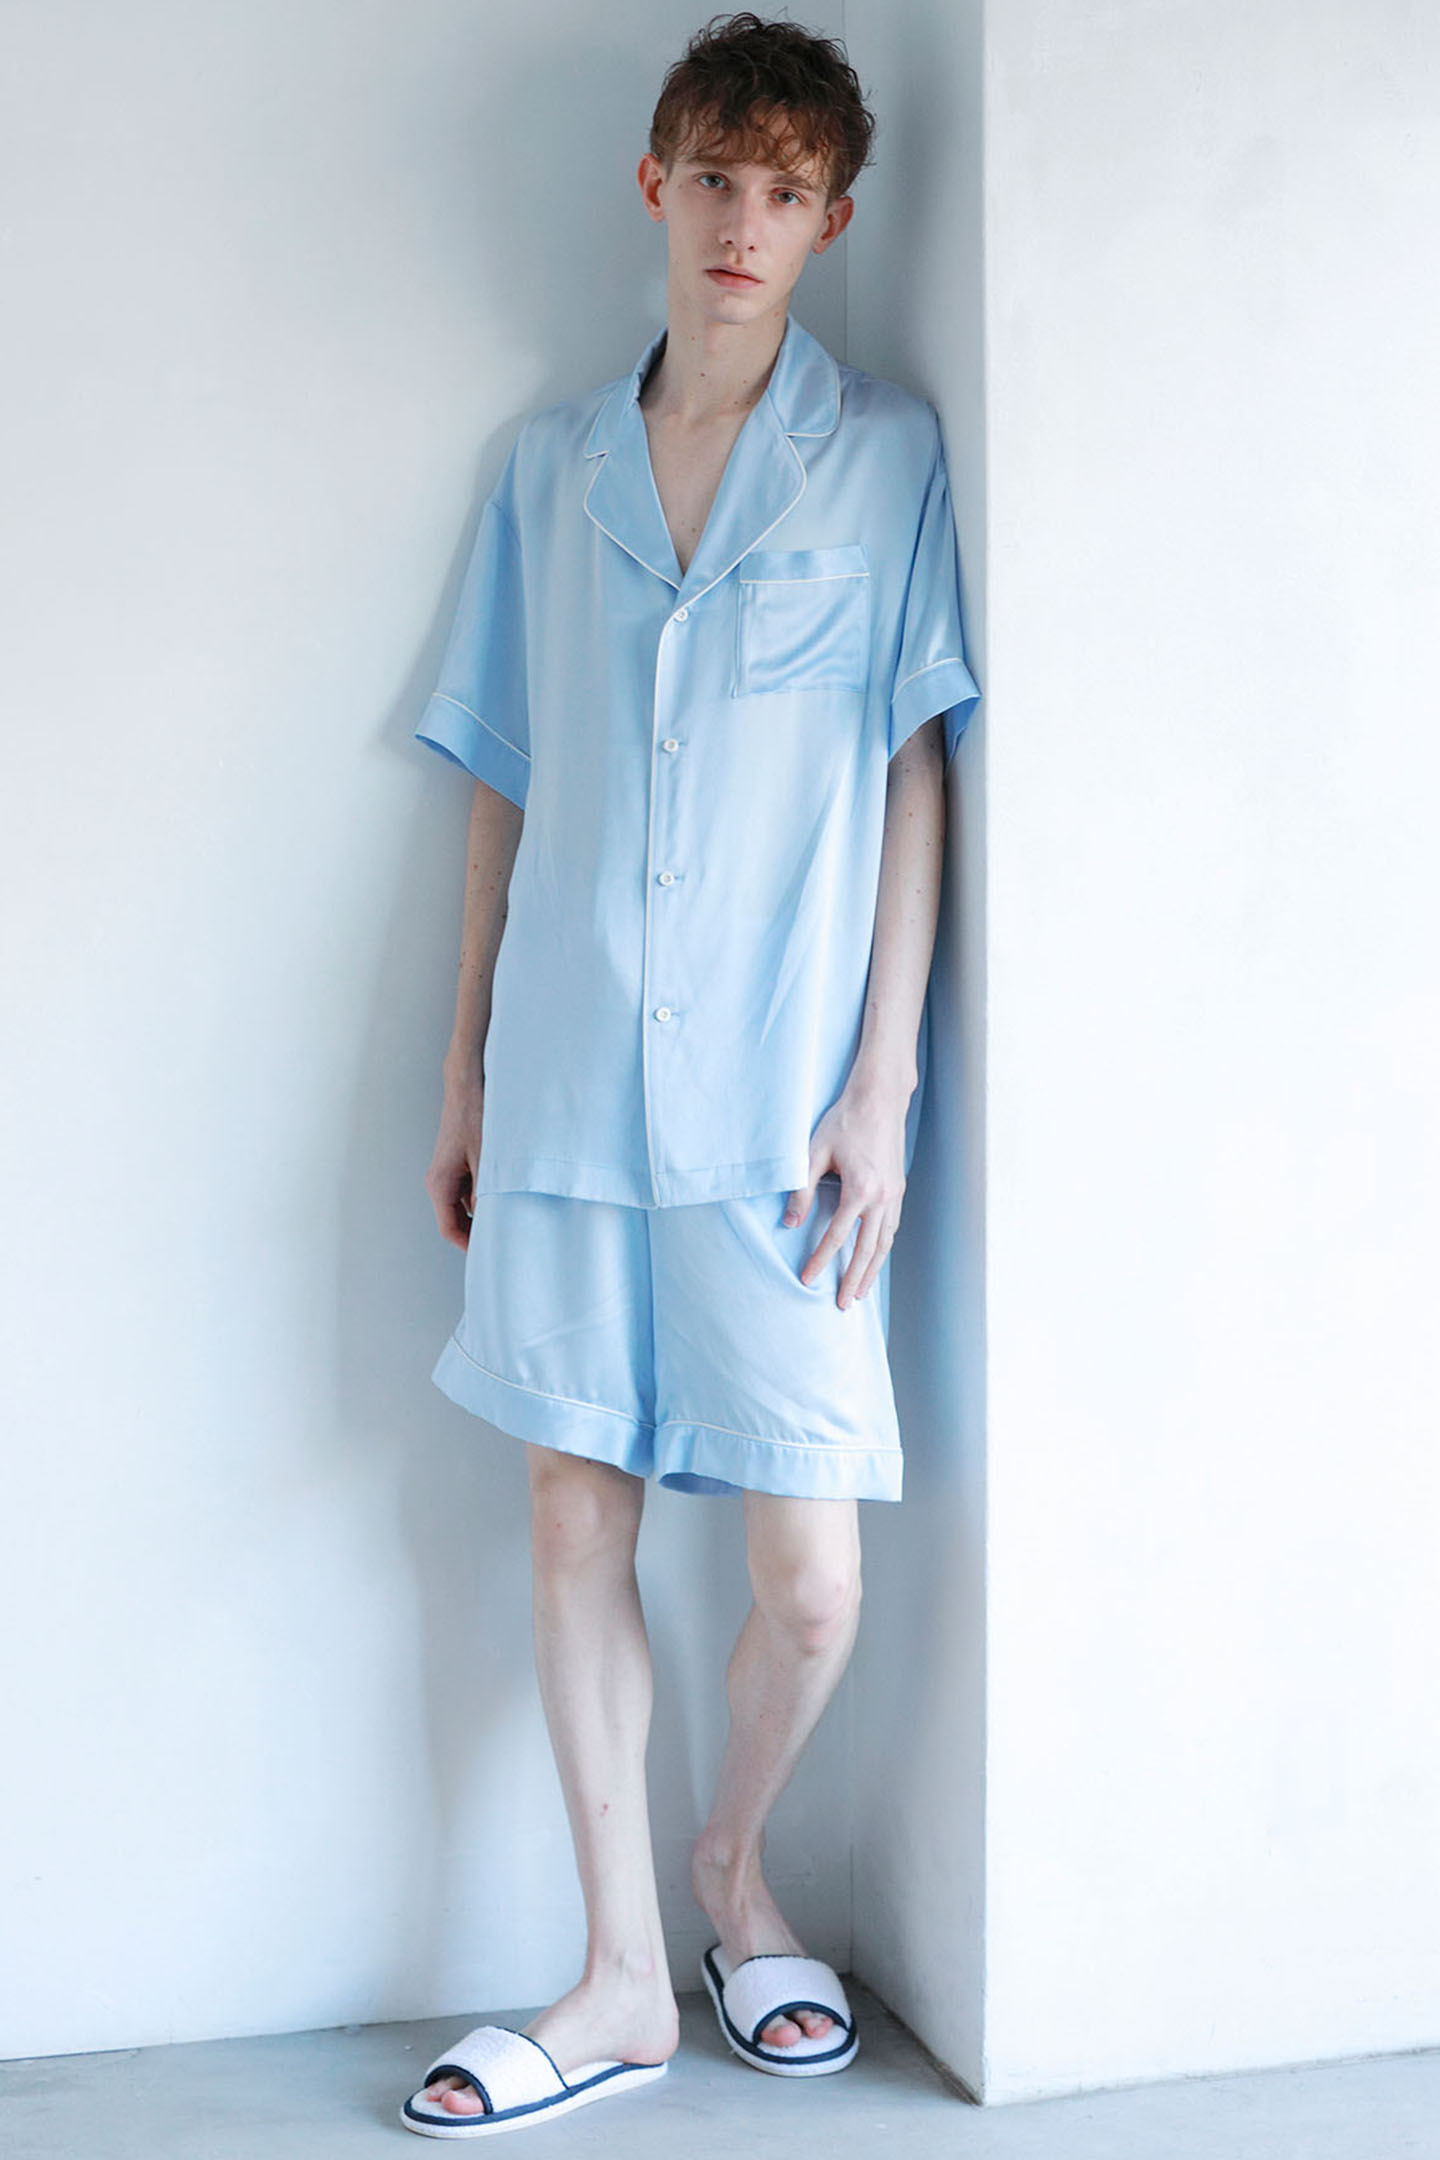 【Priv. Spoons Club(プライベート・スプーンズ・クラブ)】  メンズシルクパジャマ/半袖トップス ※上下別売り